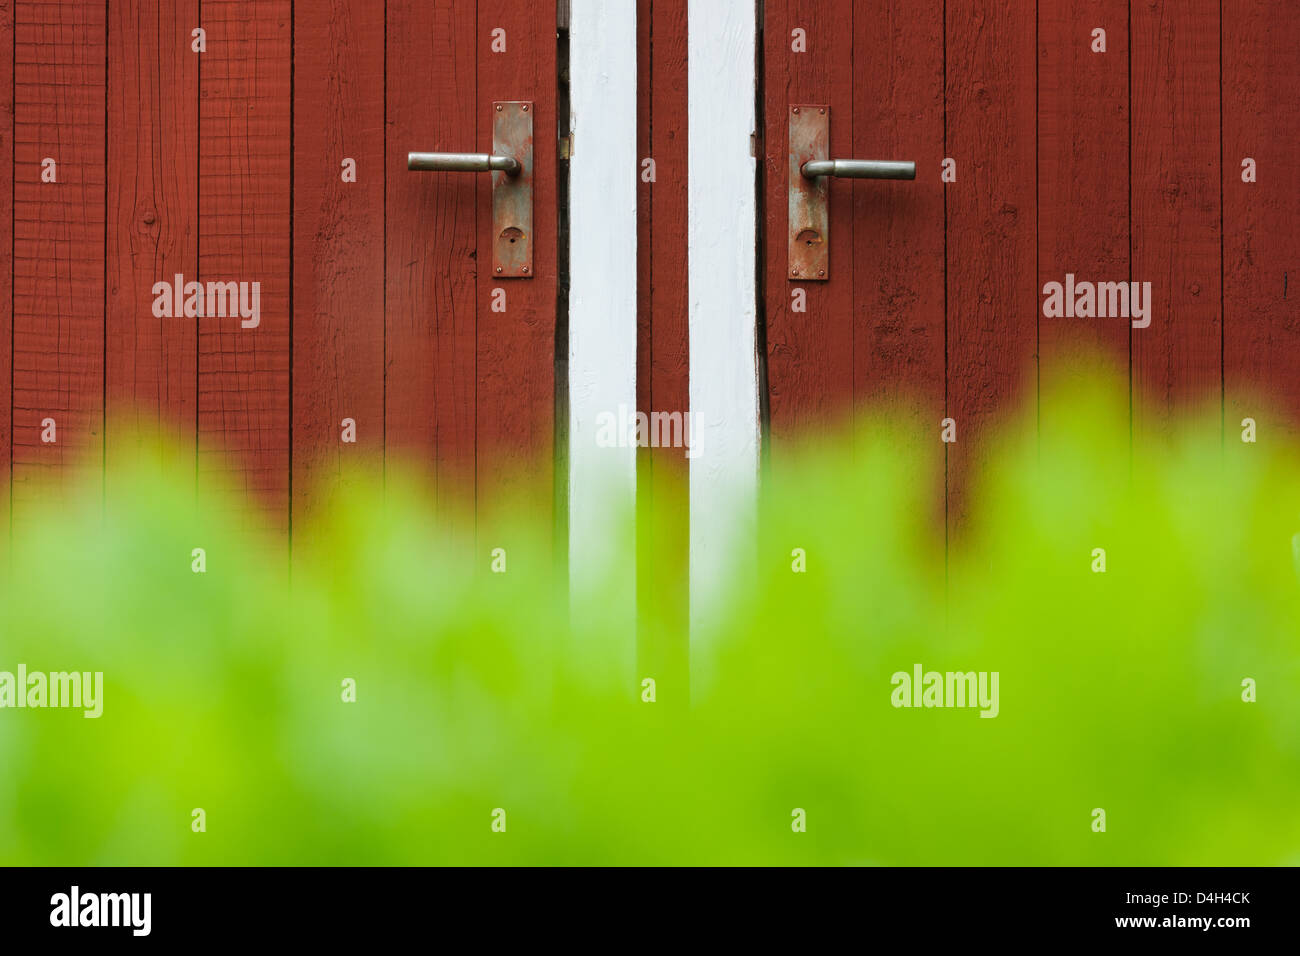 Closed farmhouse doors, Åtvidaberg, Östergötland, Sweden, Europe - Stock Image